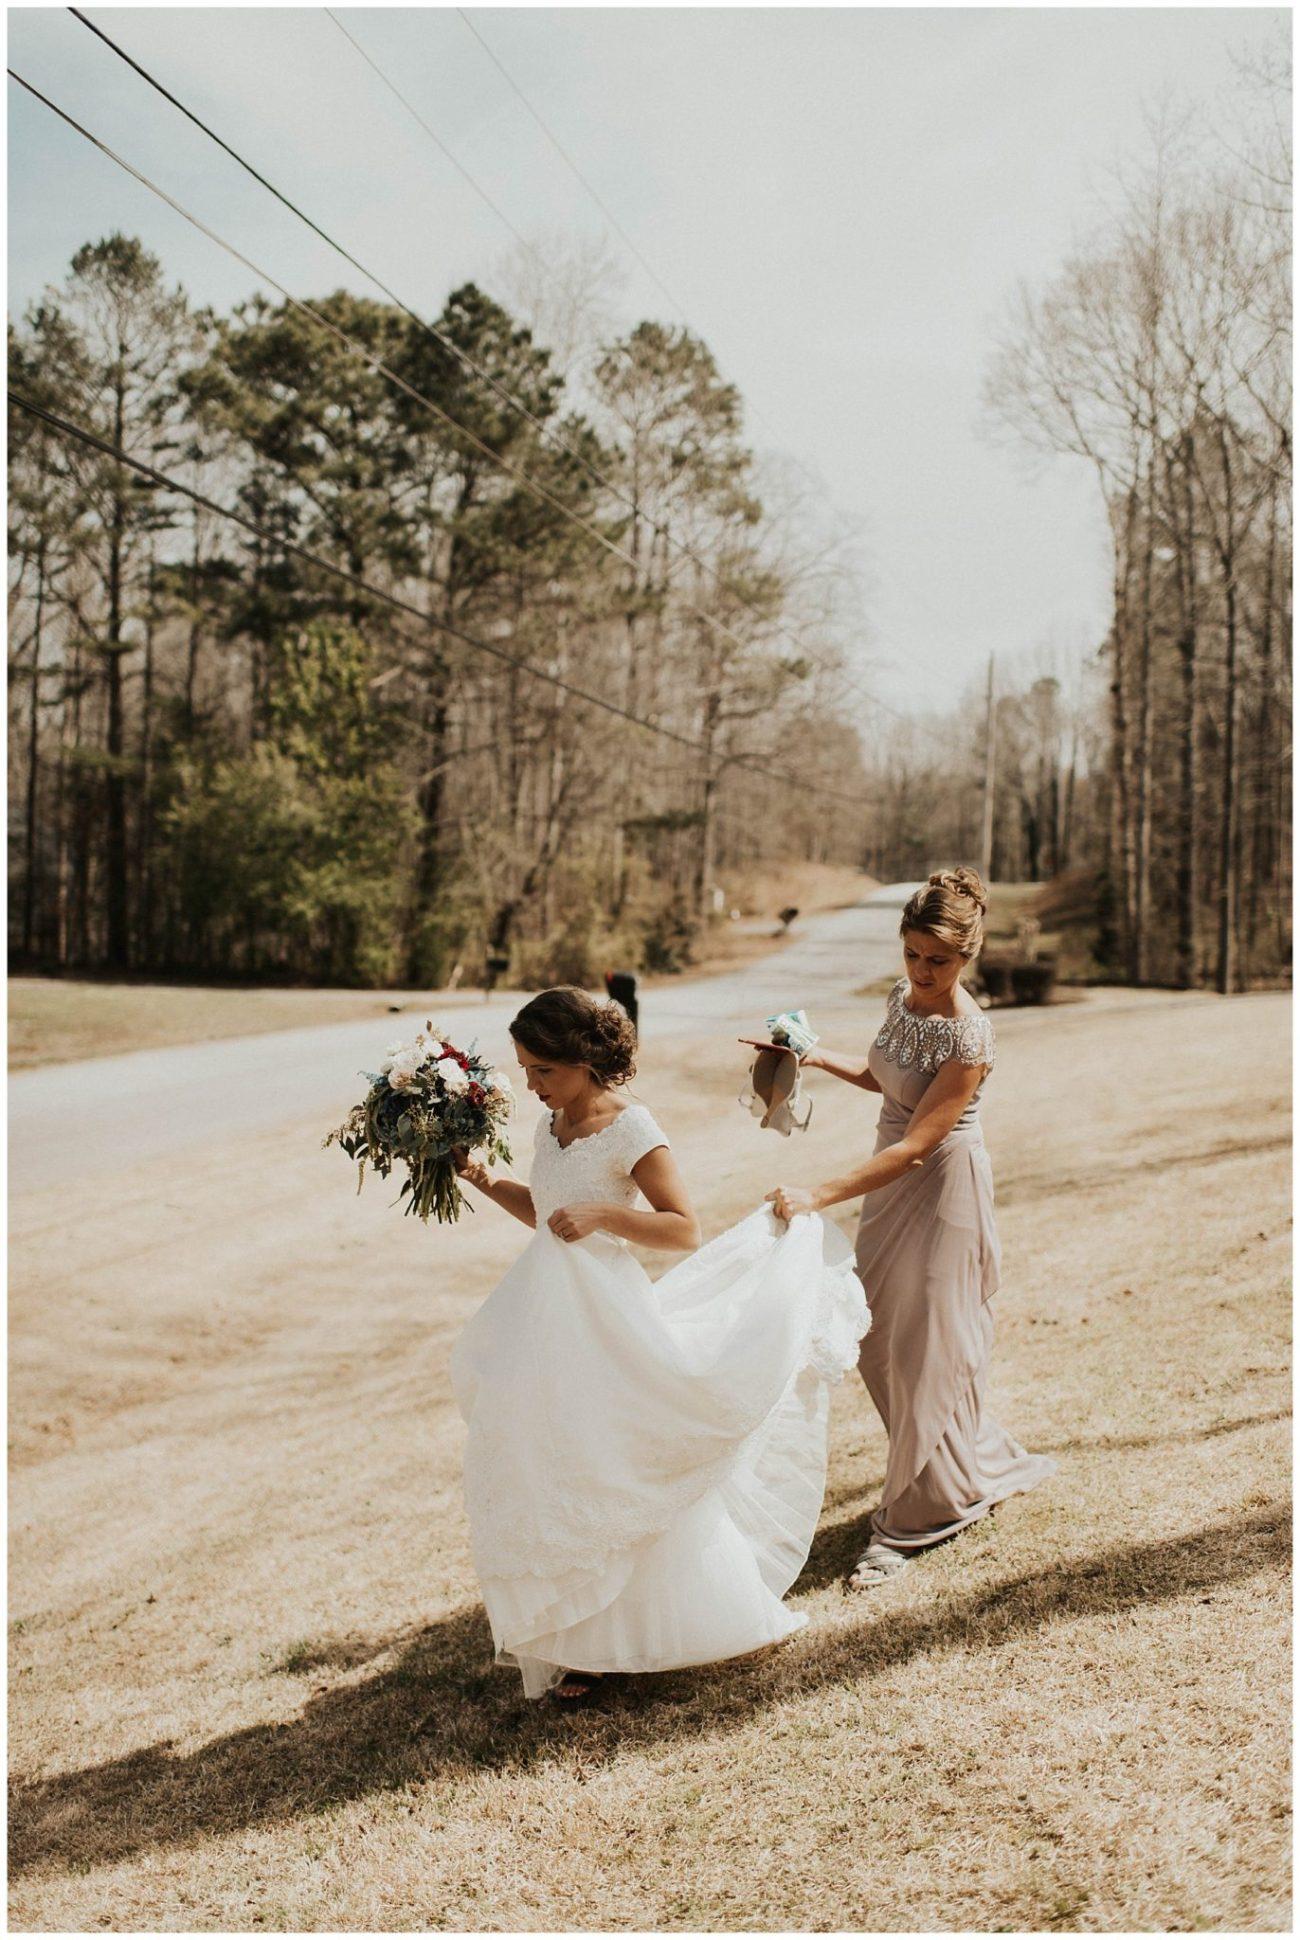 bdba507a7 Derek + Naomi    Whimsical Georgia Wedding – Lauren F.otography